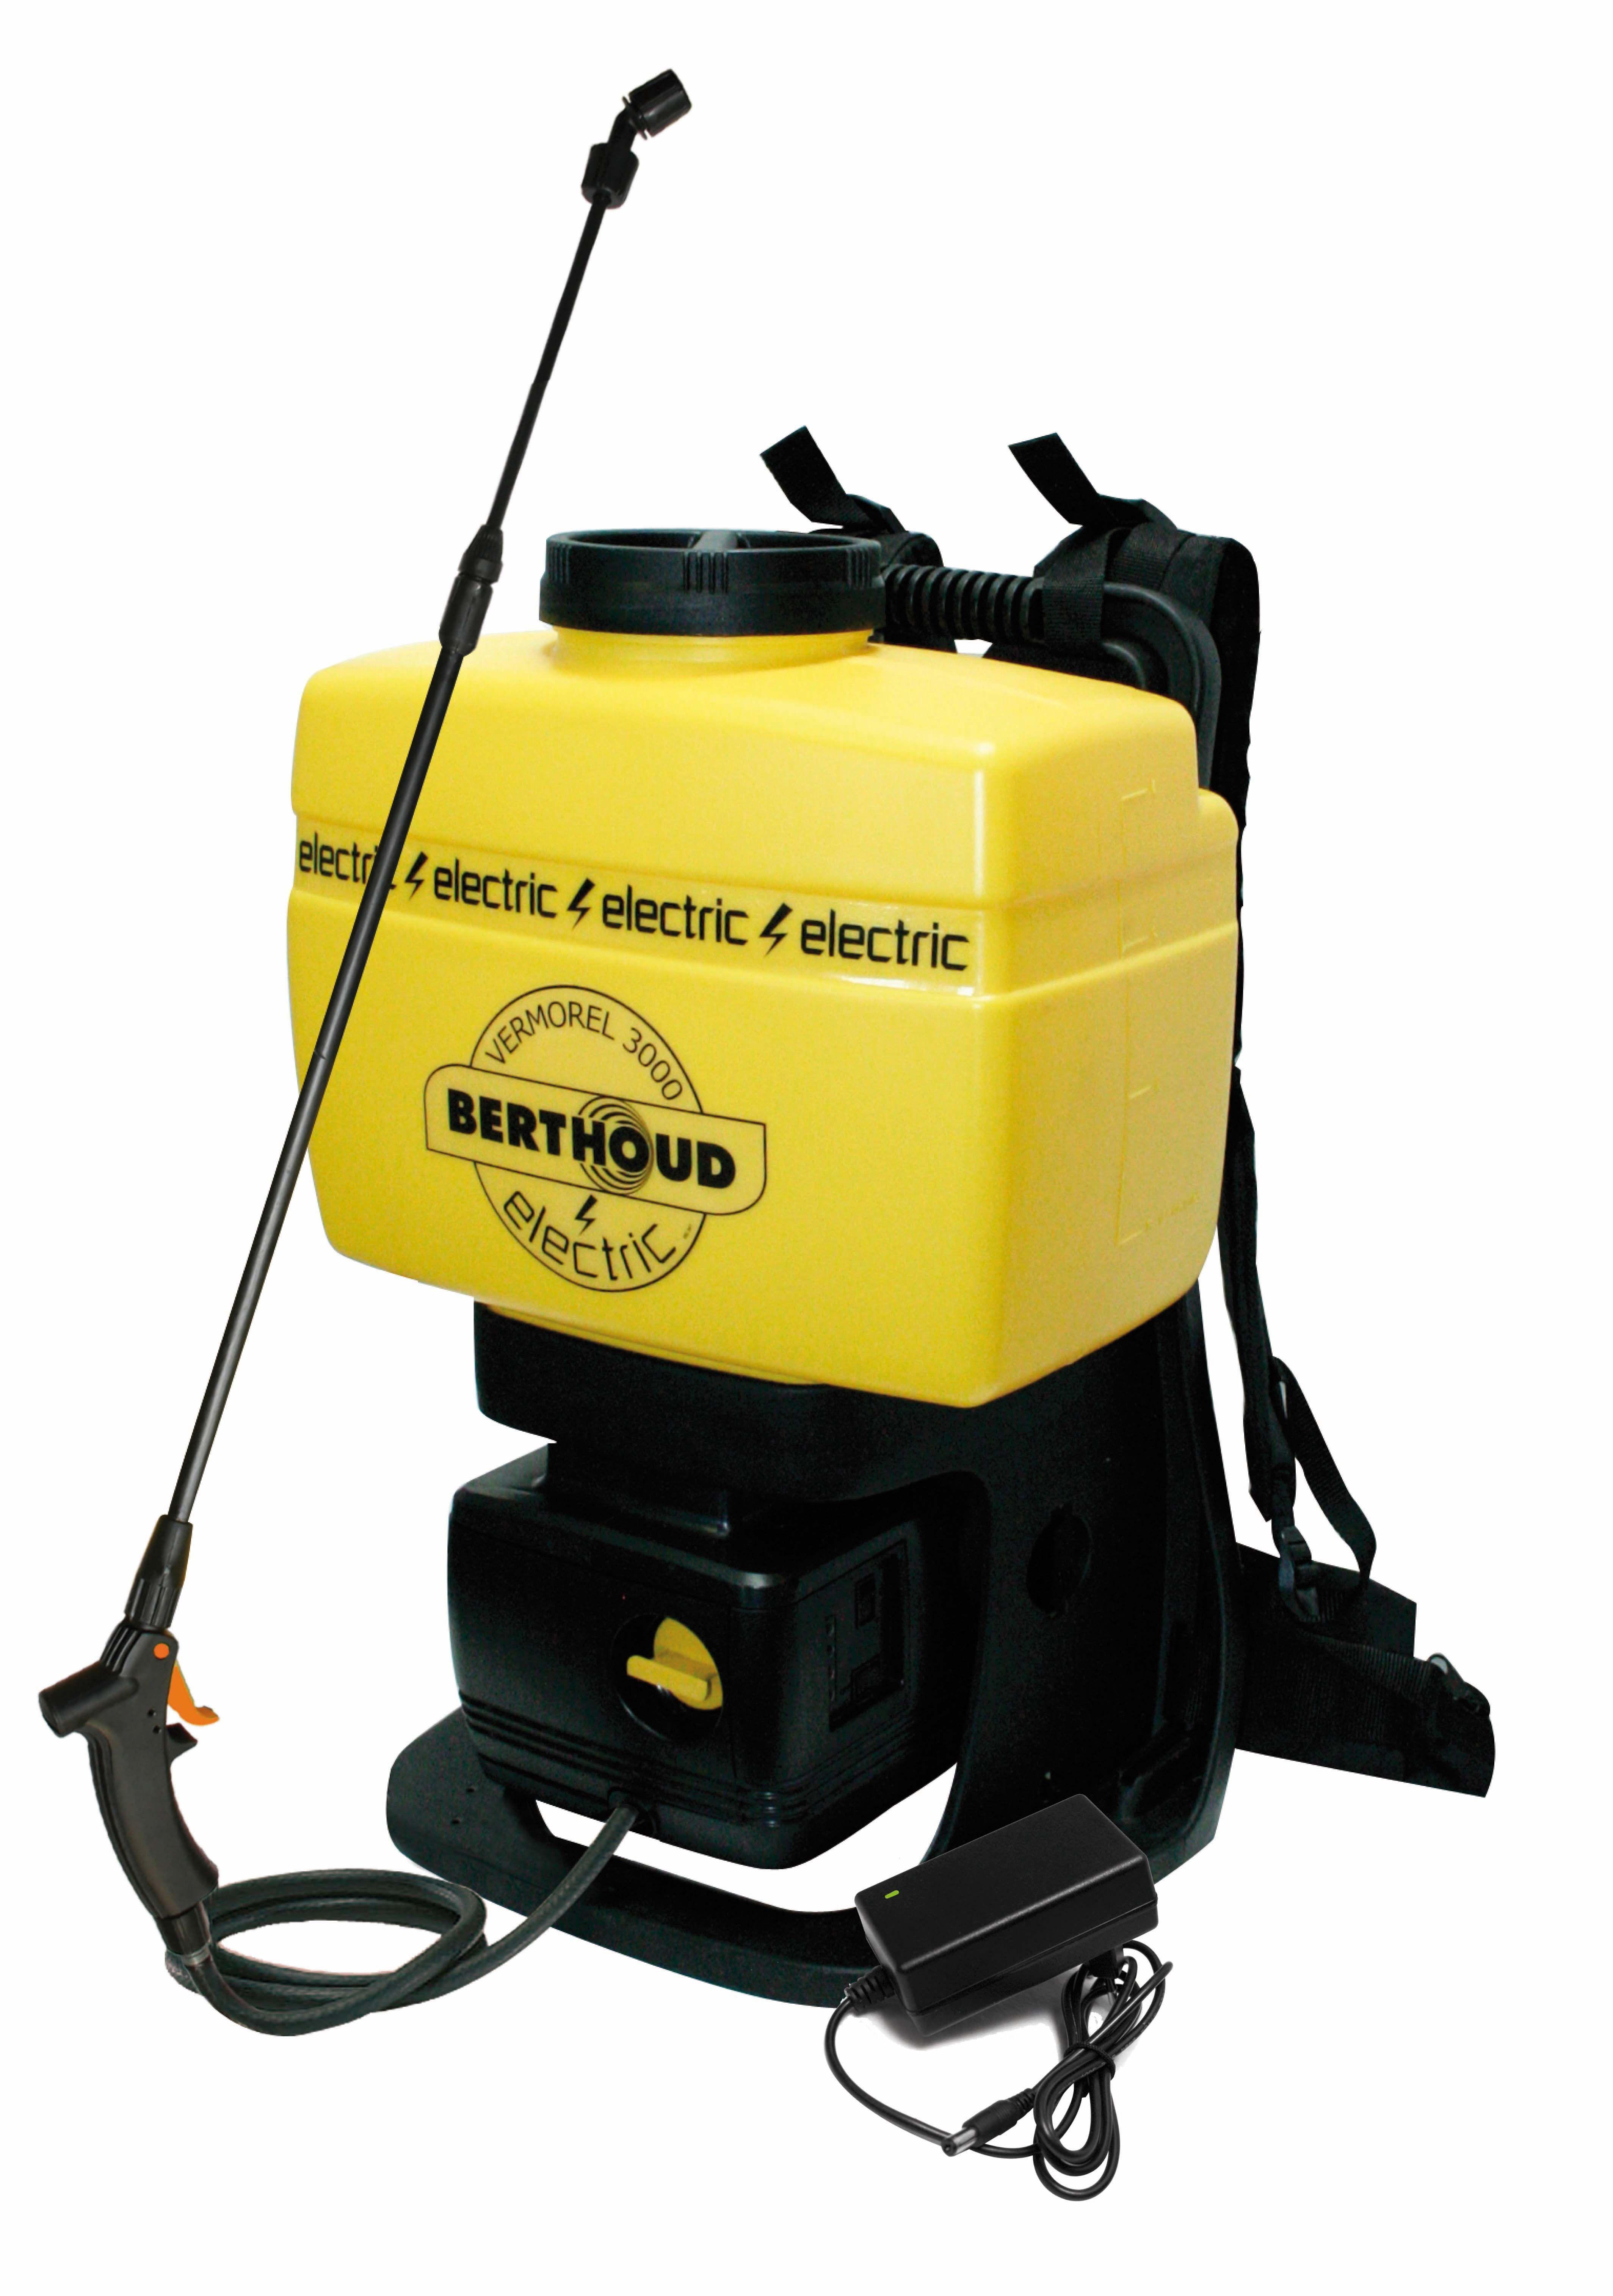 Electric Berthoud Vermoral 3000 18L